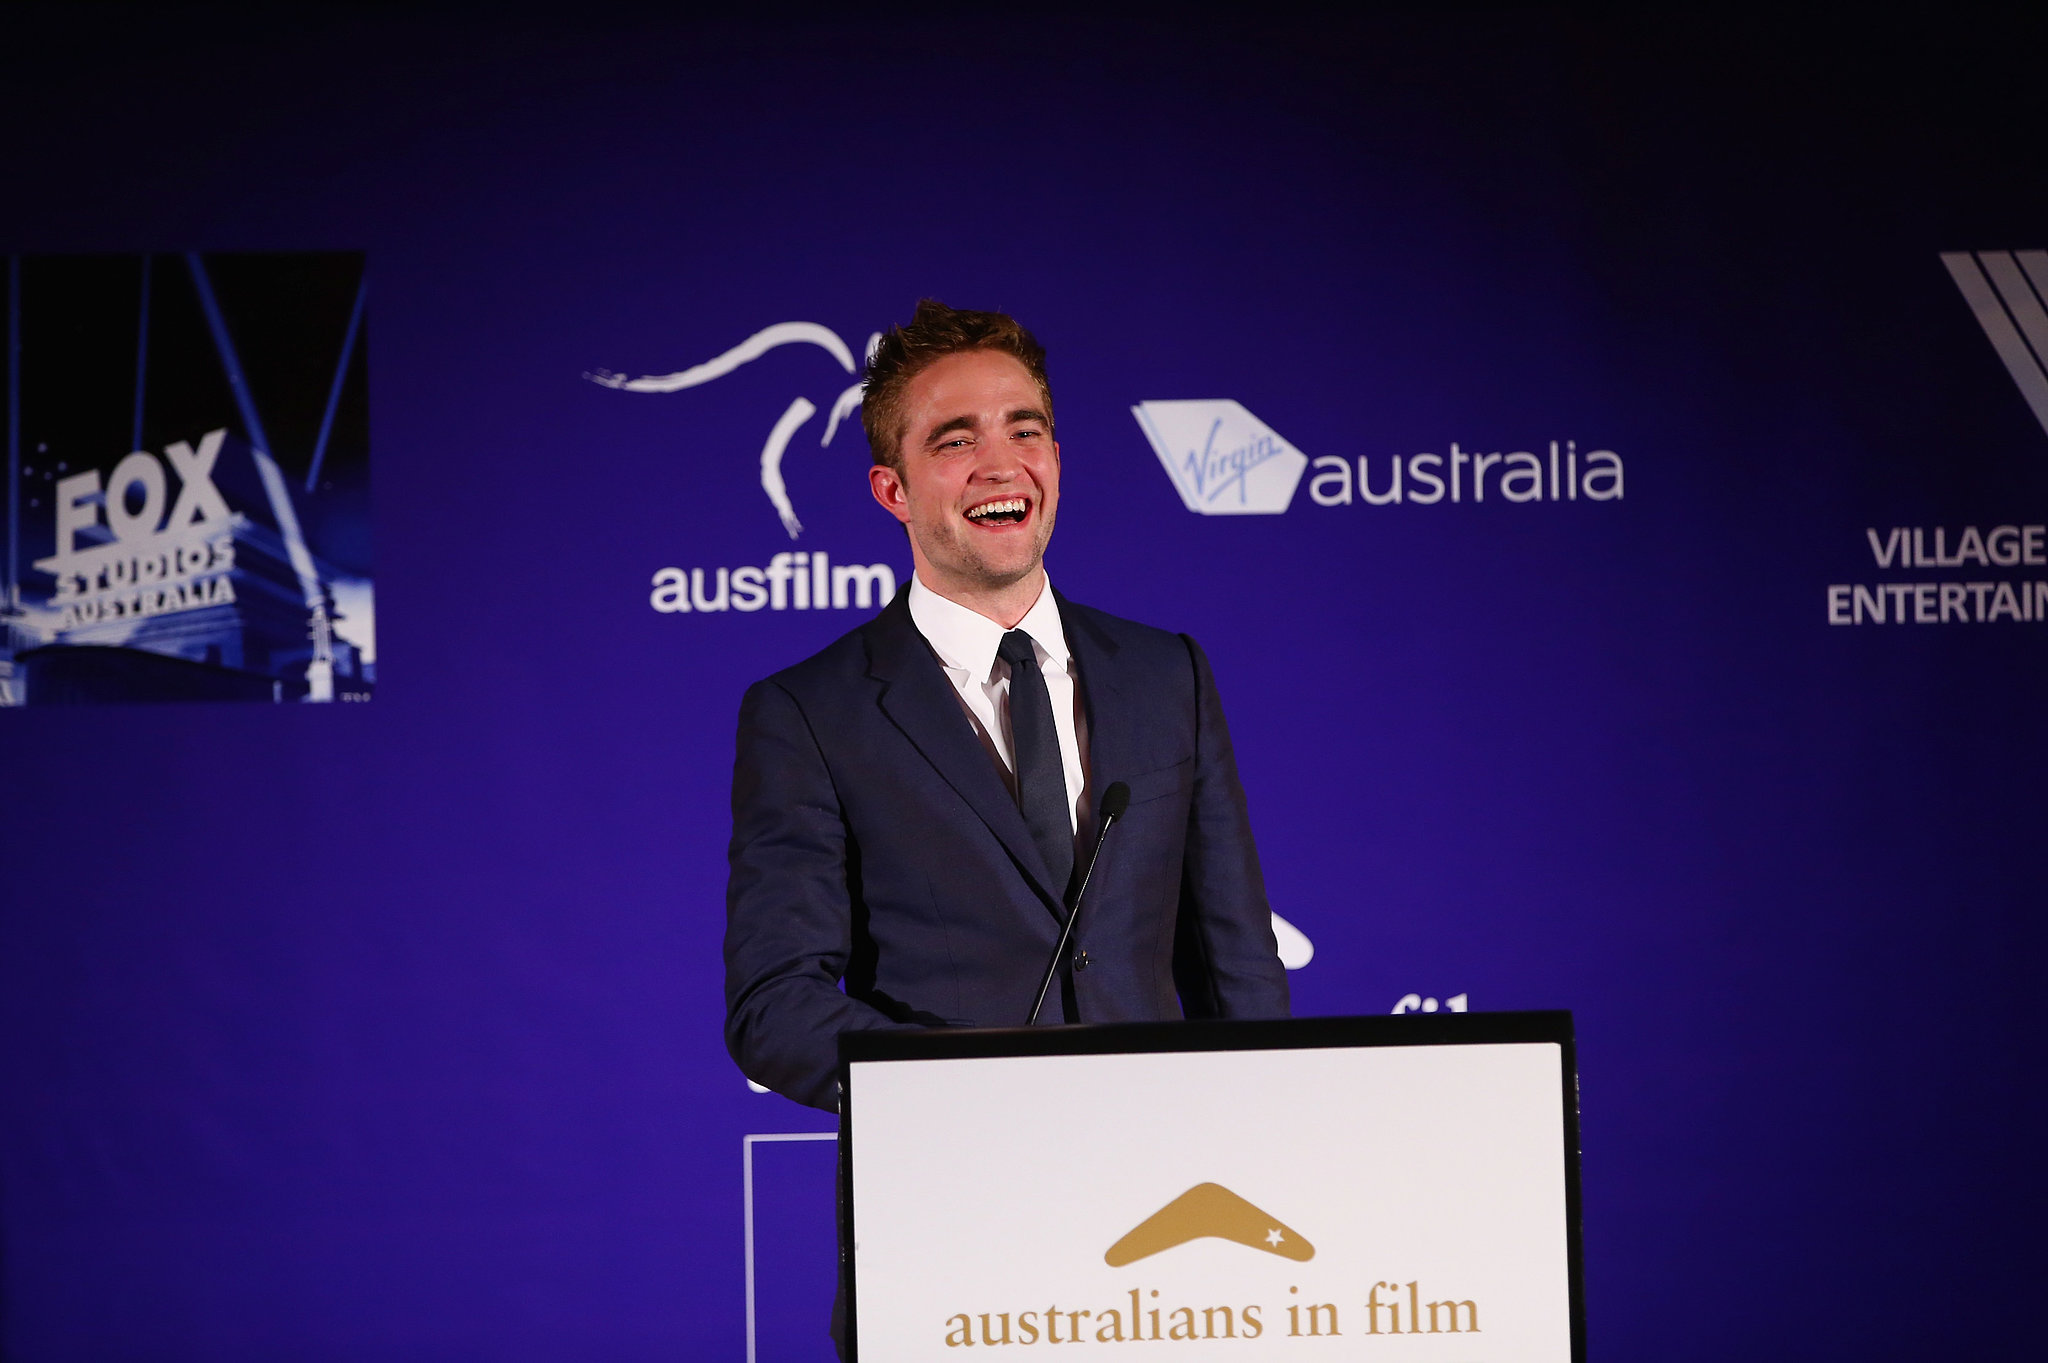 Robert Pattinson presented an award at LA's Australians in Film Awards.